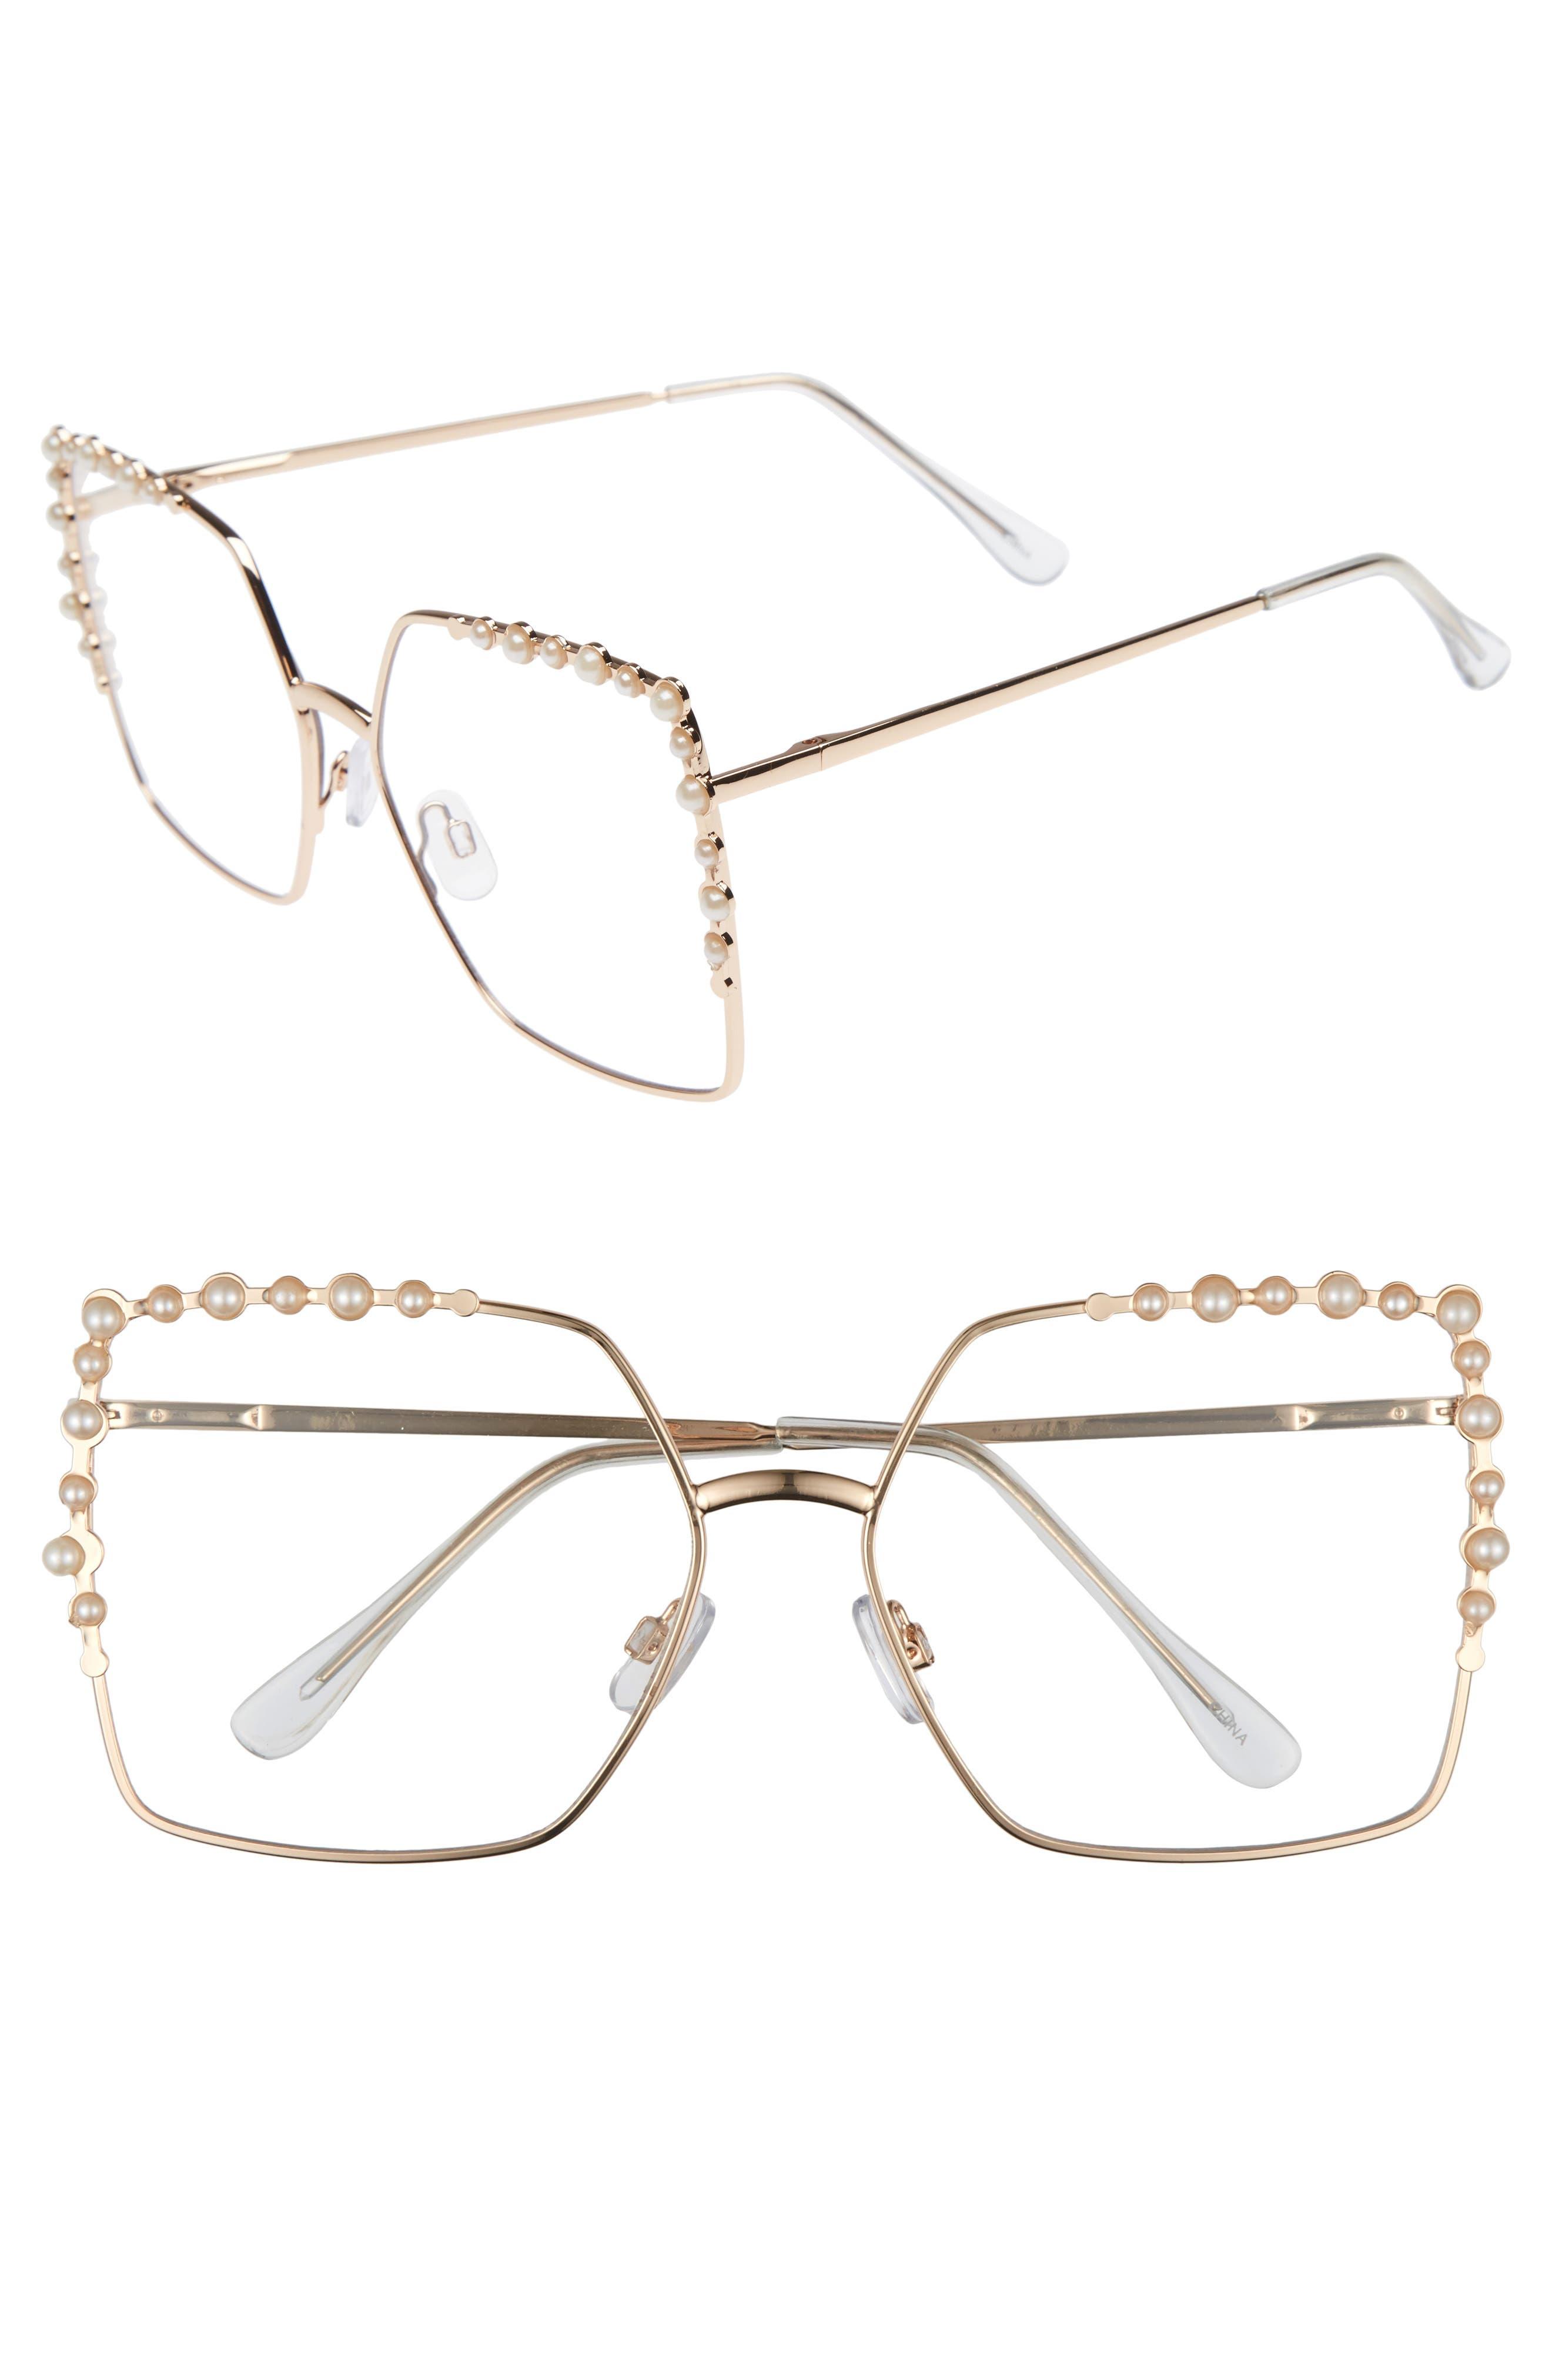 63mm Imitation Pearl Square Fashion Glasses,                             Main thumbnail 1, color,                             Gold/ Pearl